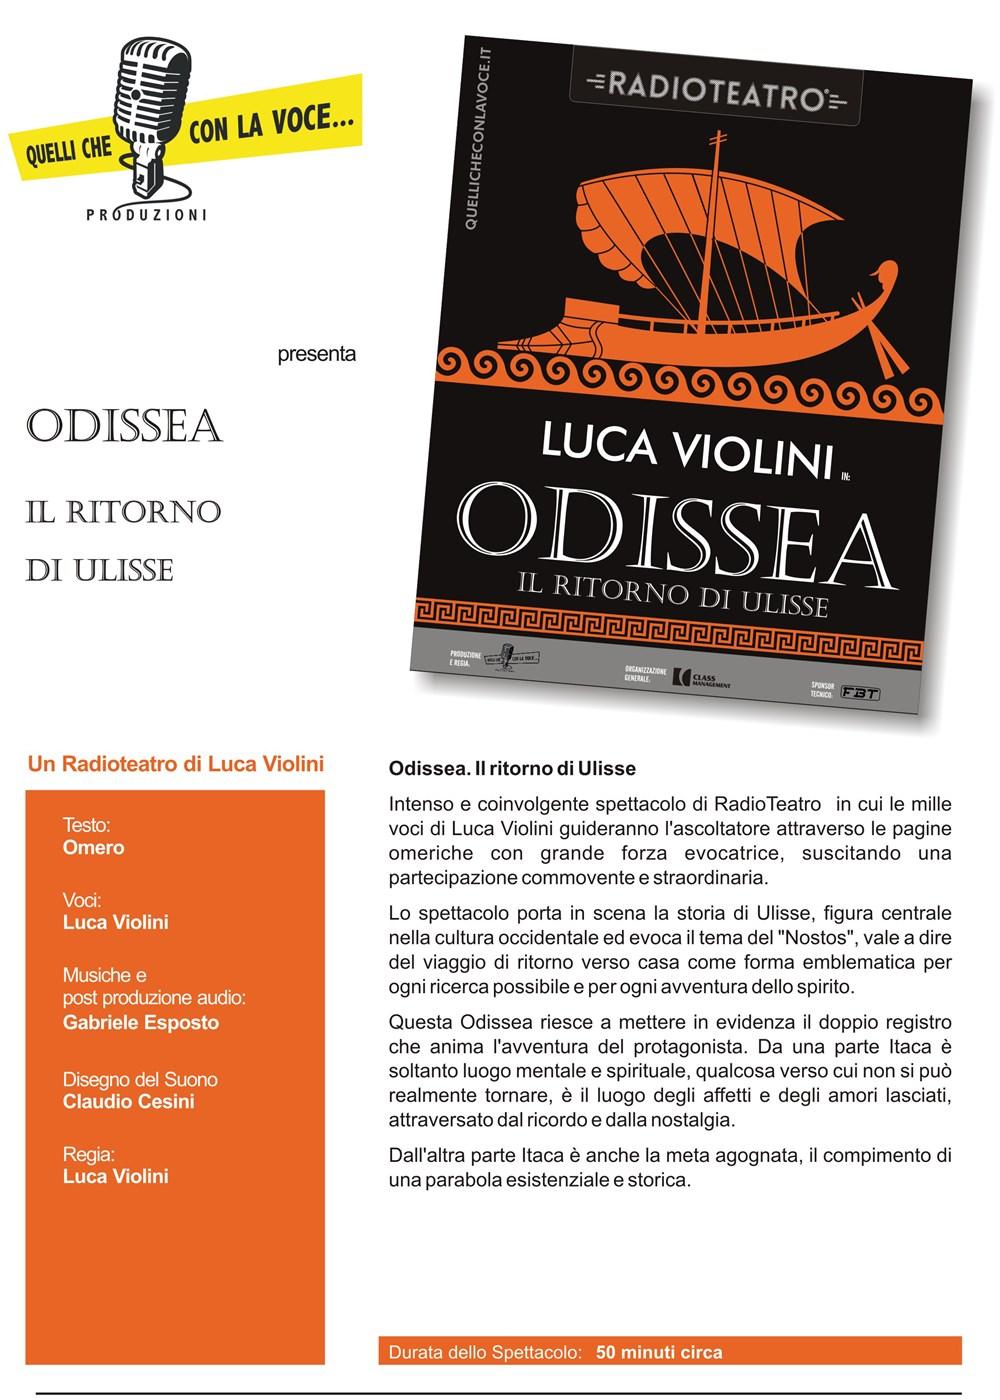 SchedaPresentazione_ODISSEA